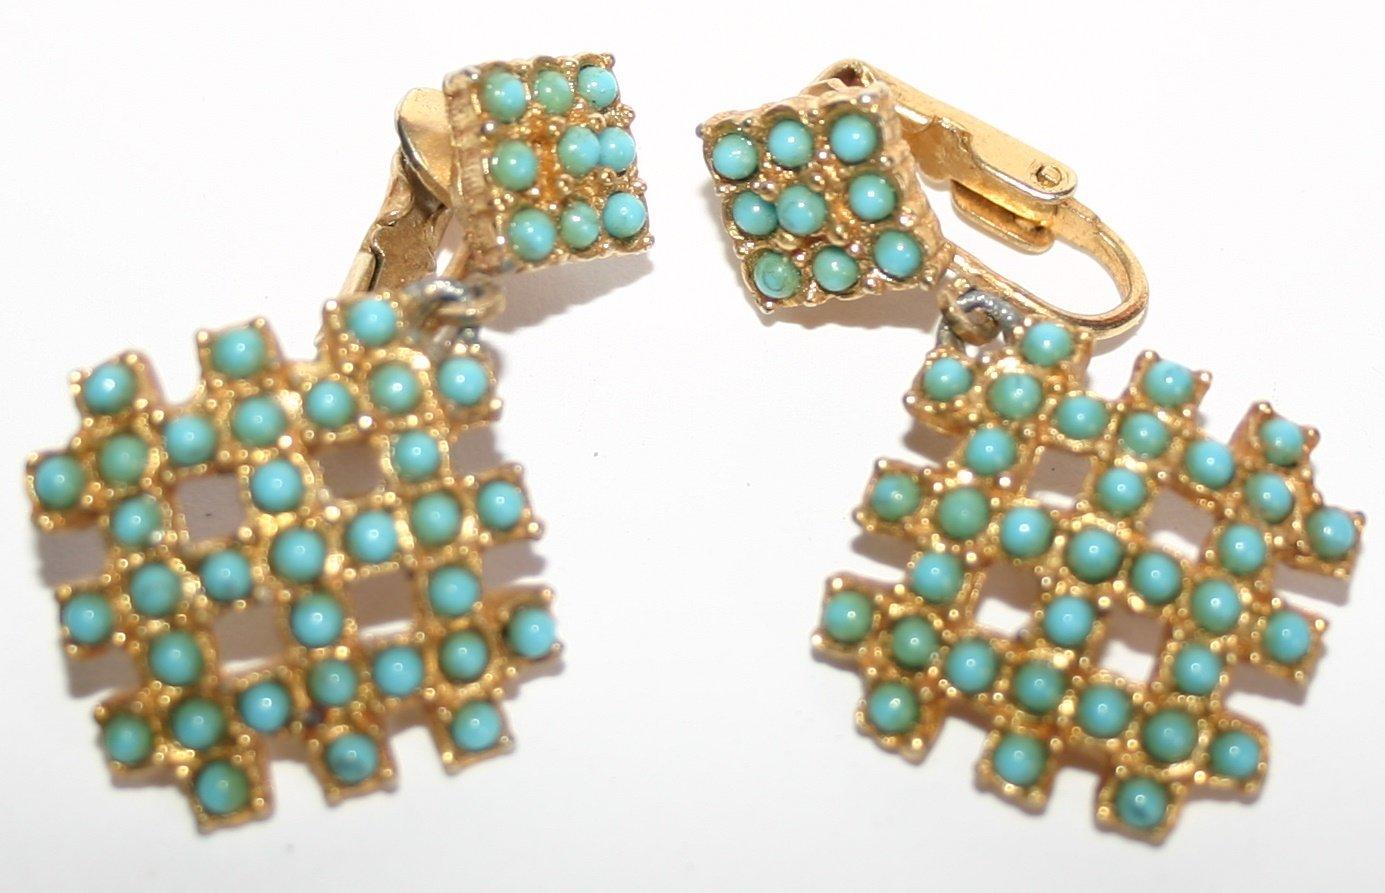 Vintage Art Deco Cubic Style Clip On Ladies Earrings